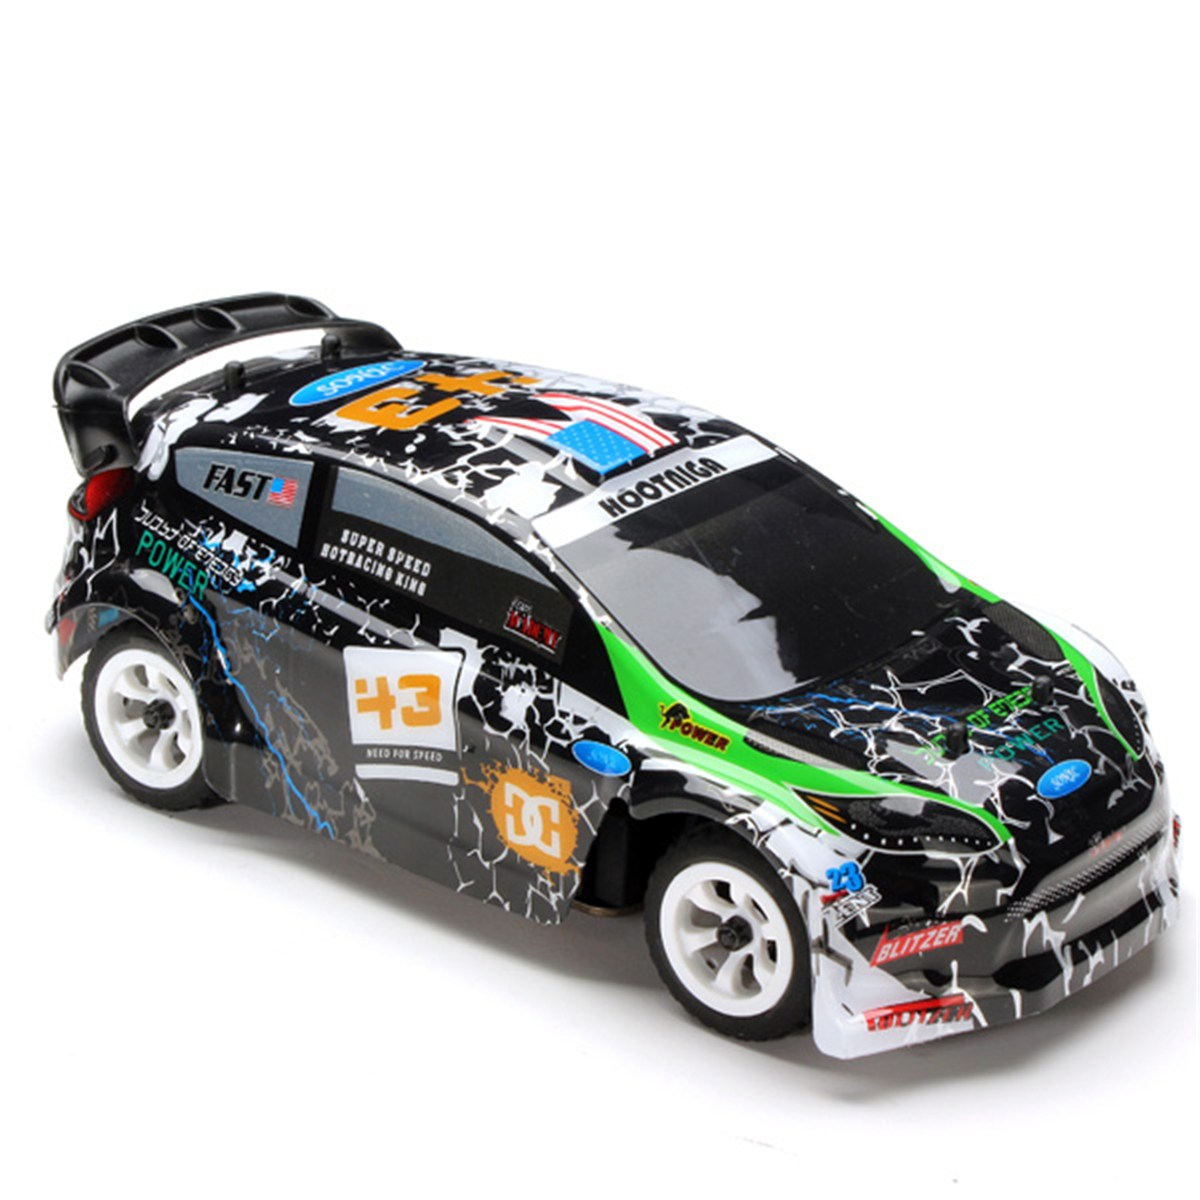 Wltoys K989 1/28 2.4G 4WD Brossé télécommande rc Rally Car RTR